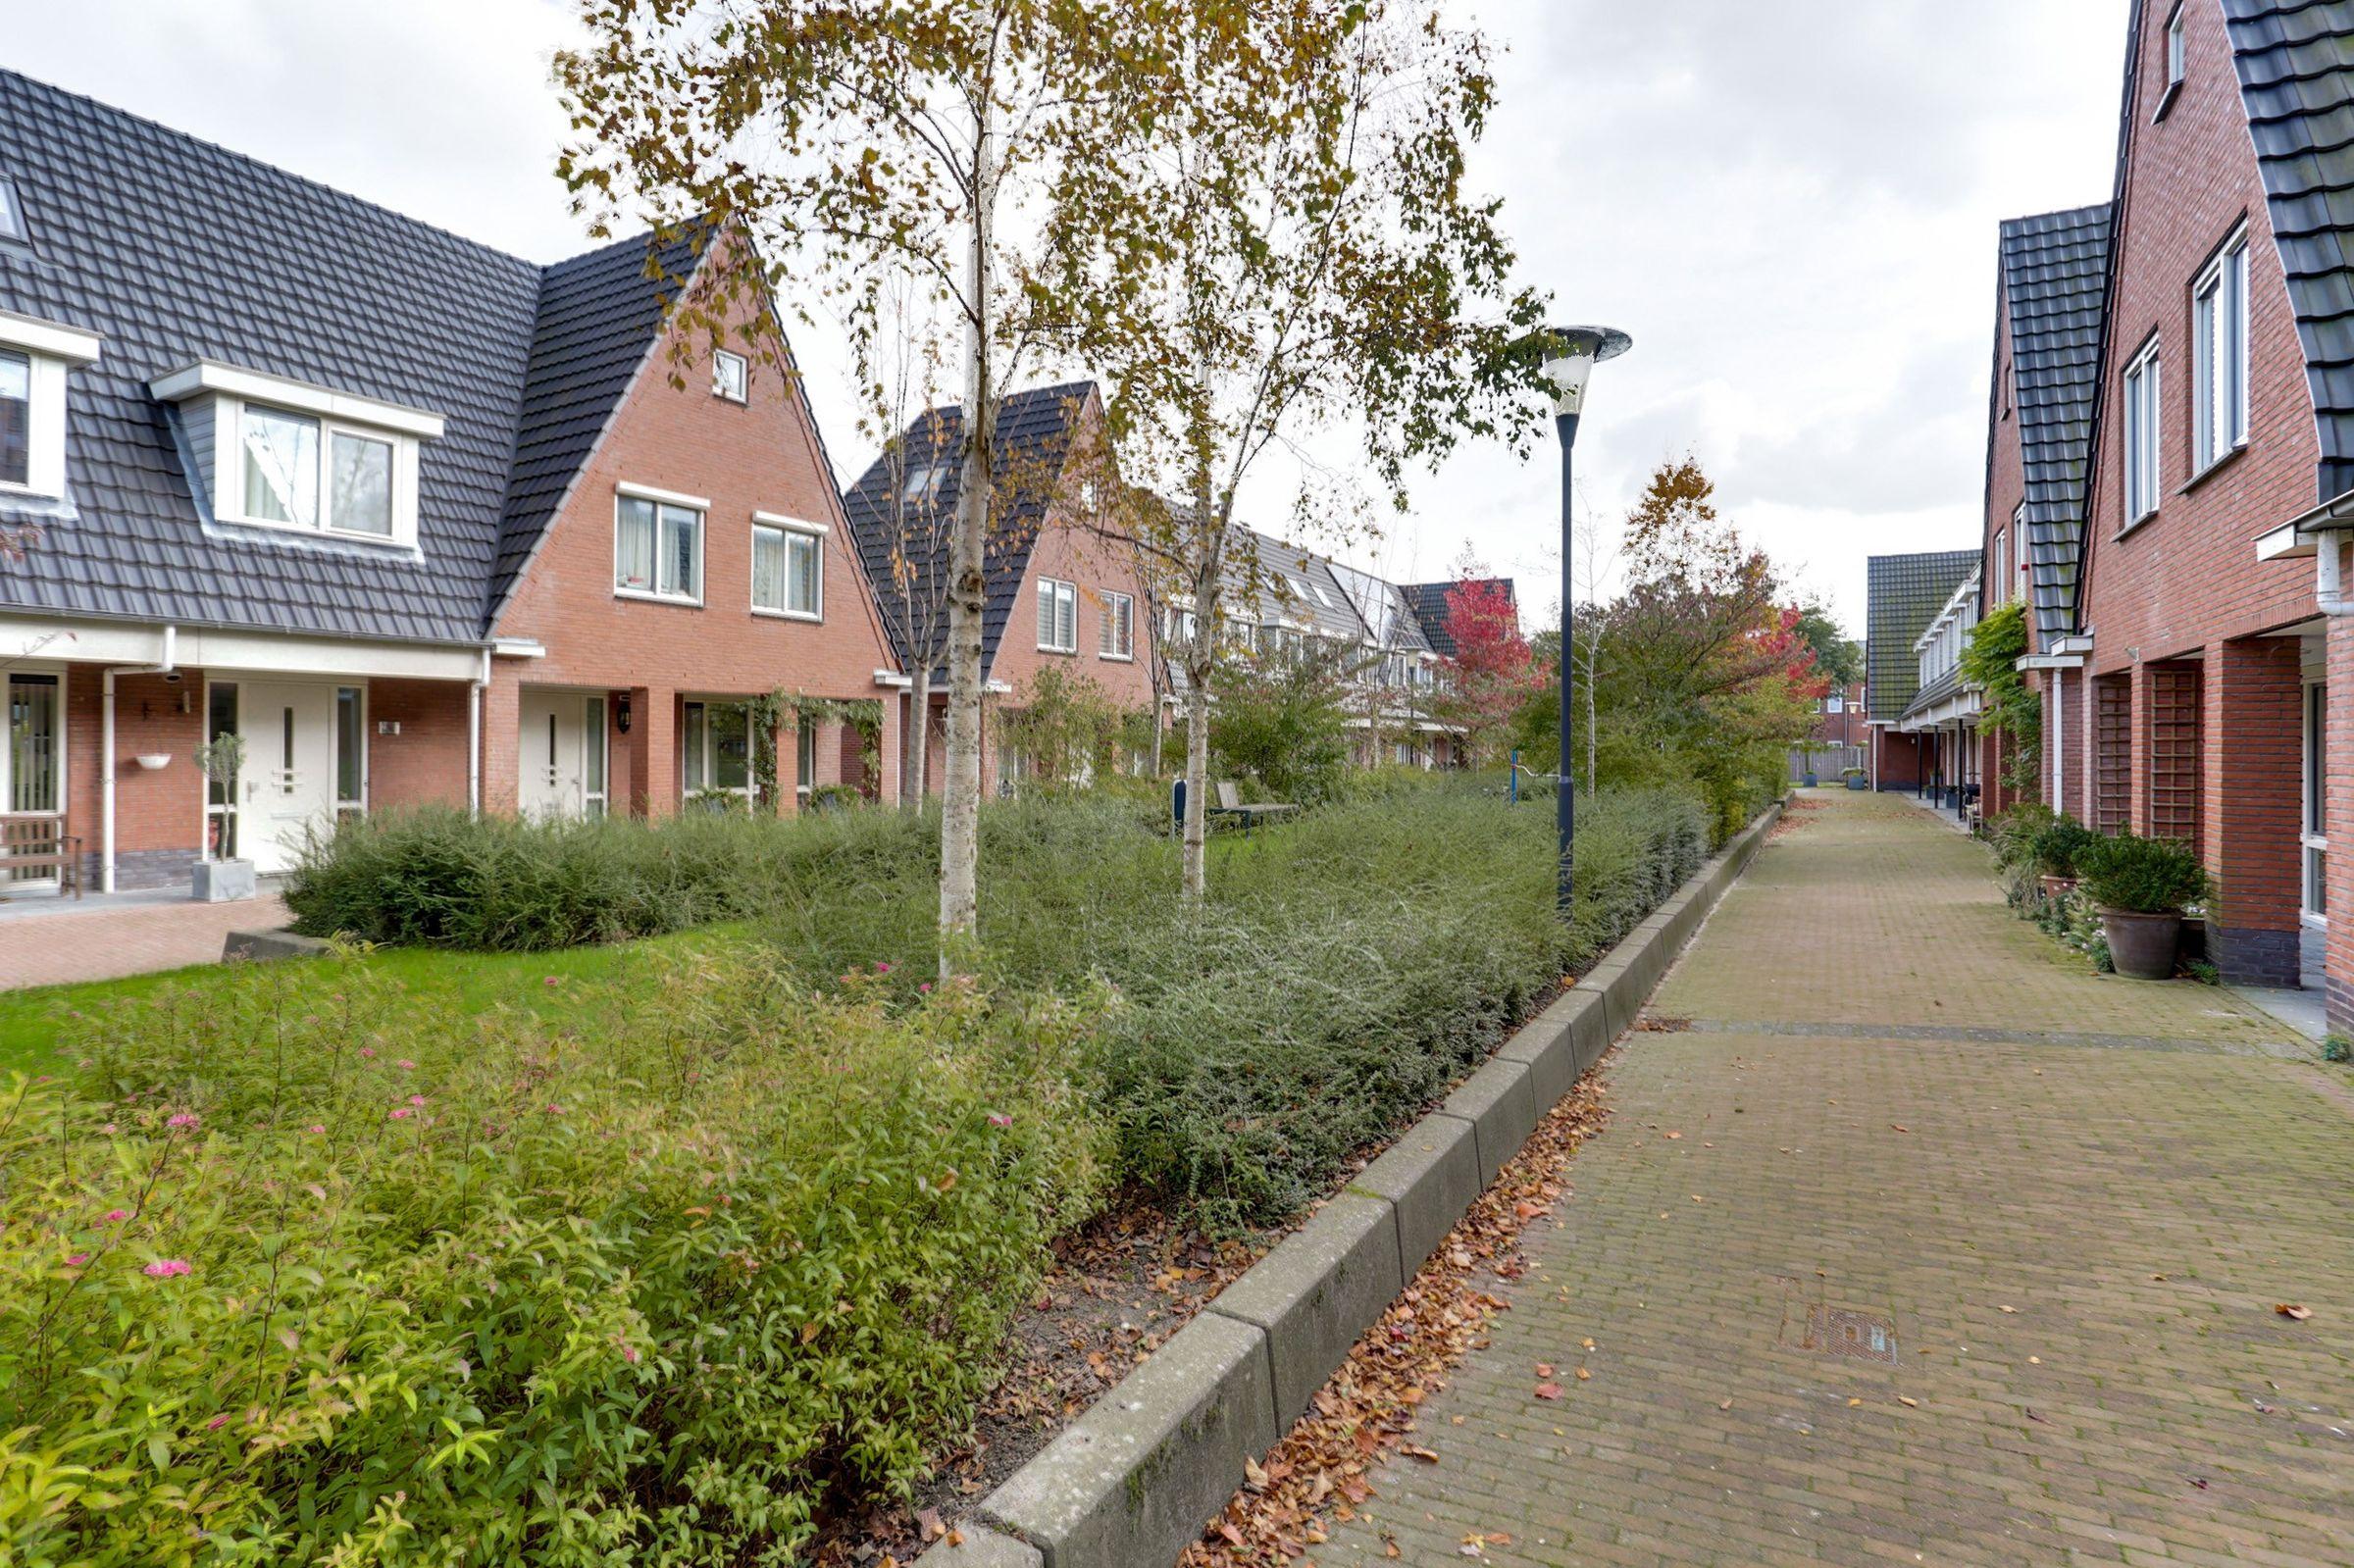 Zandoogjestraat 13, Aalsmeer